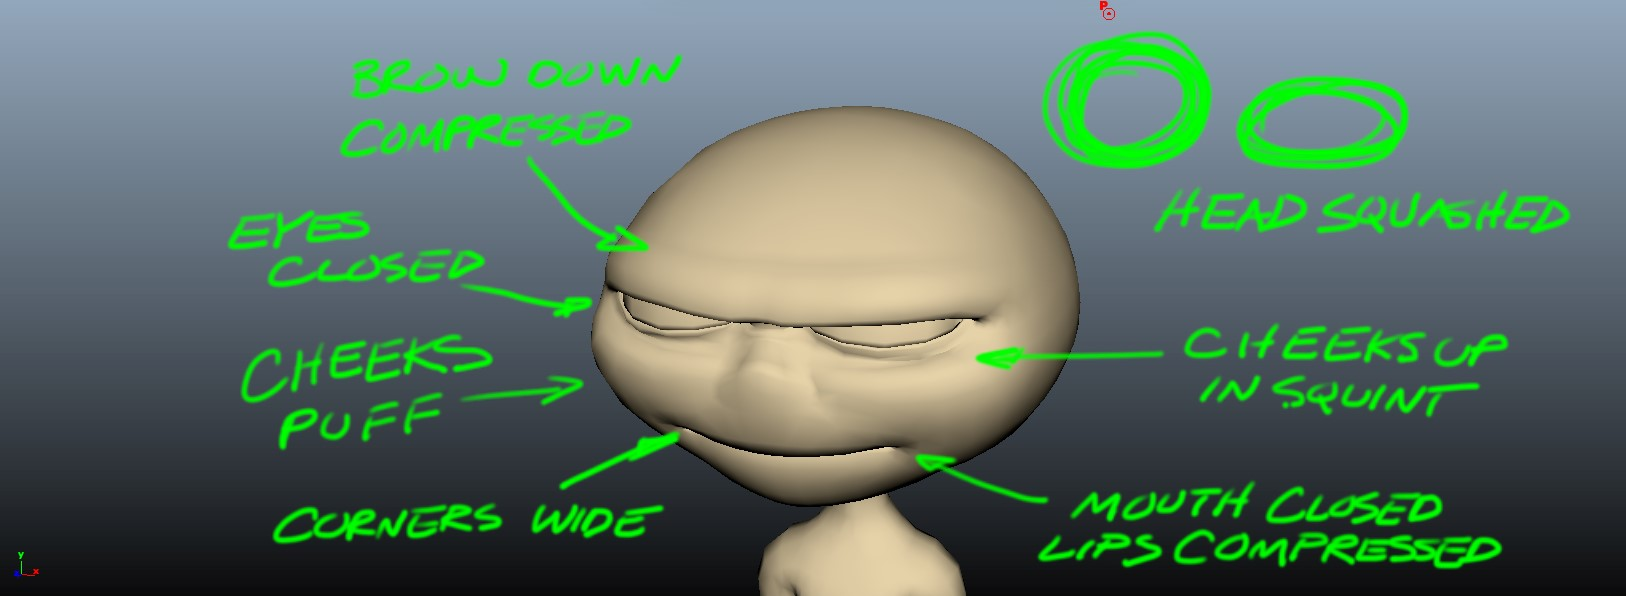 Image 5 Squash Pose Squash and Stretch: The 12 Basic Principles of Animation